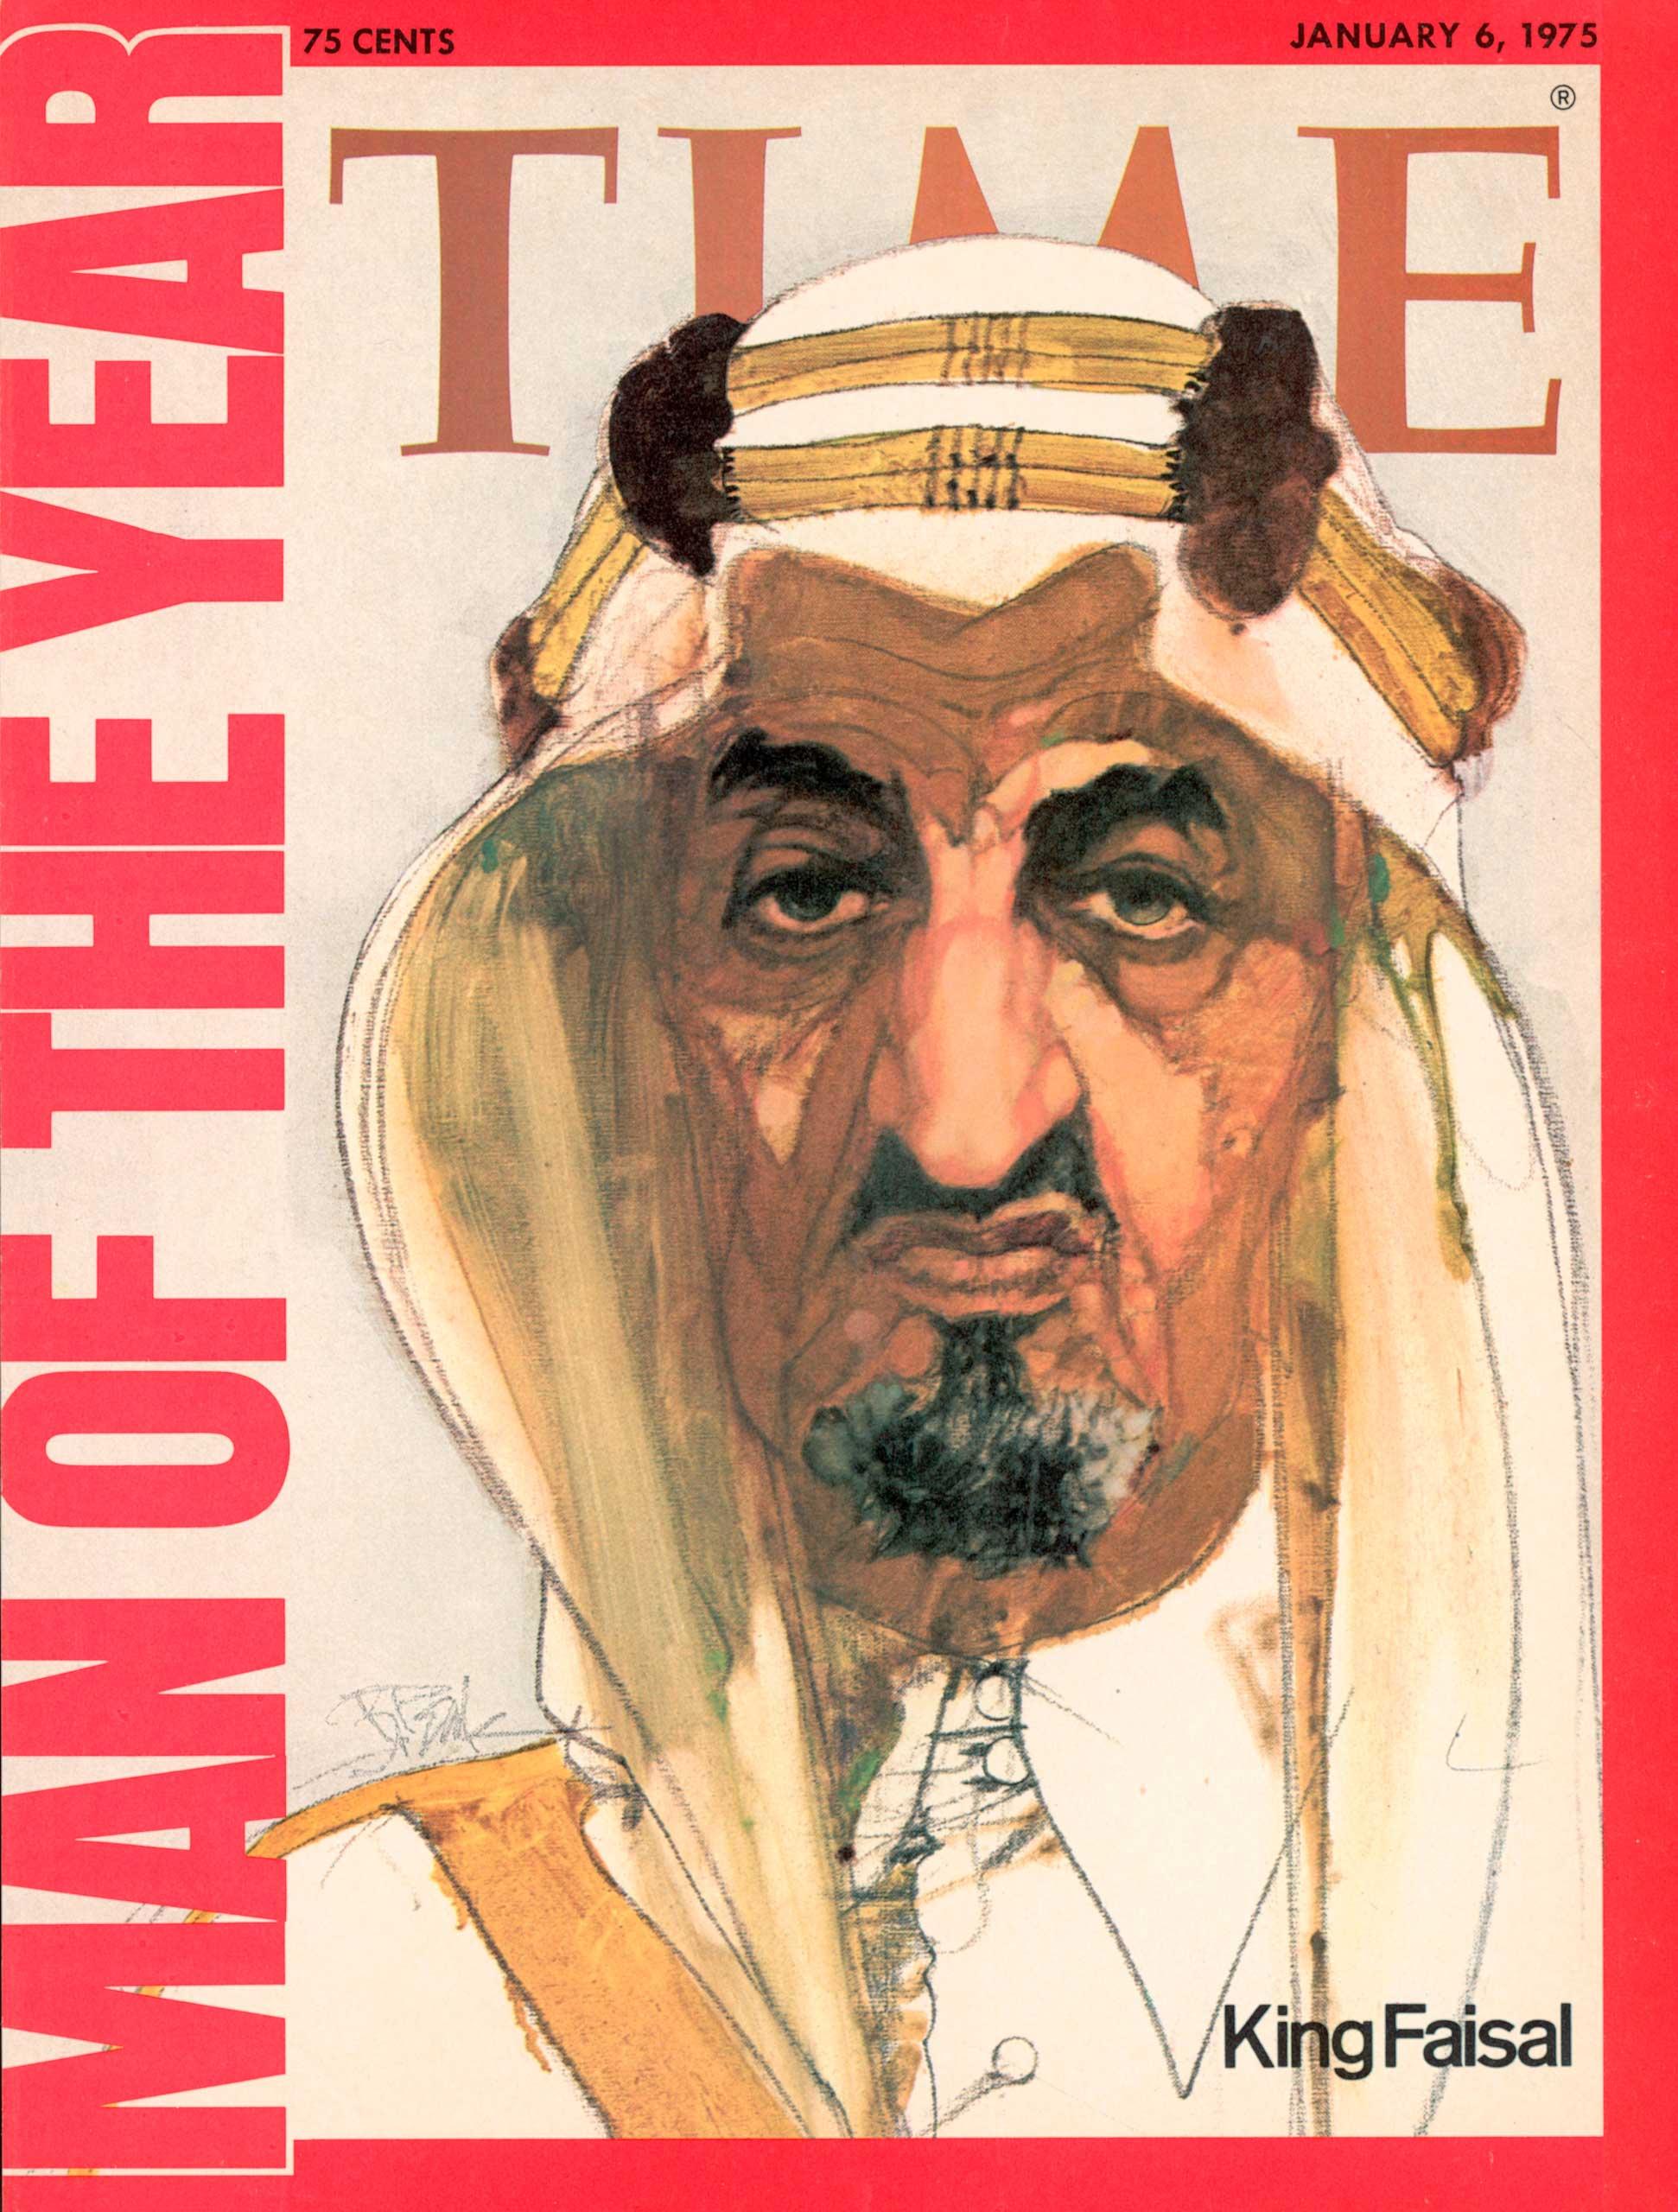 1974: King Faisal